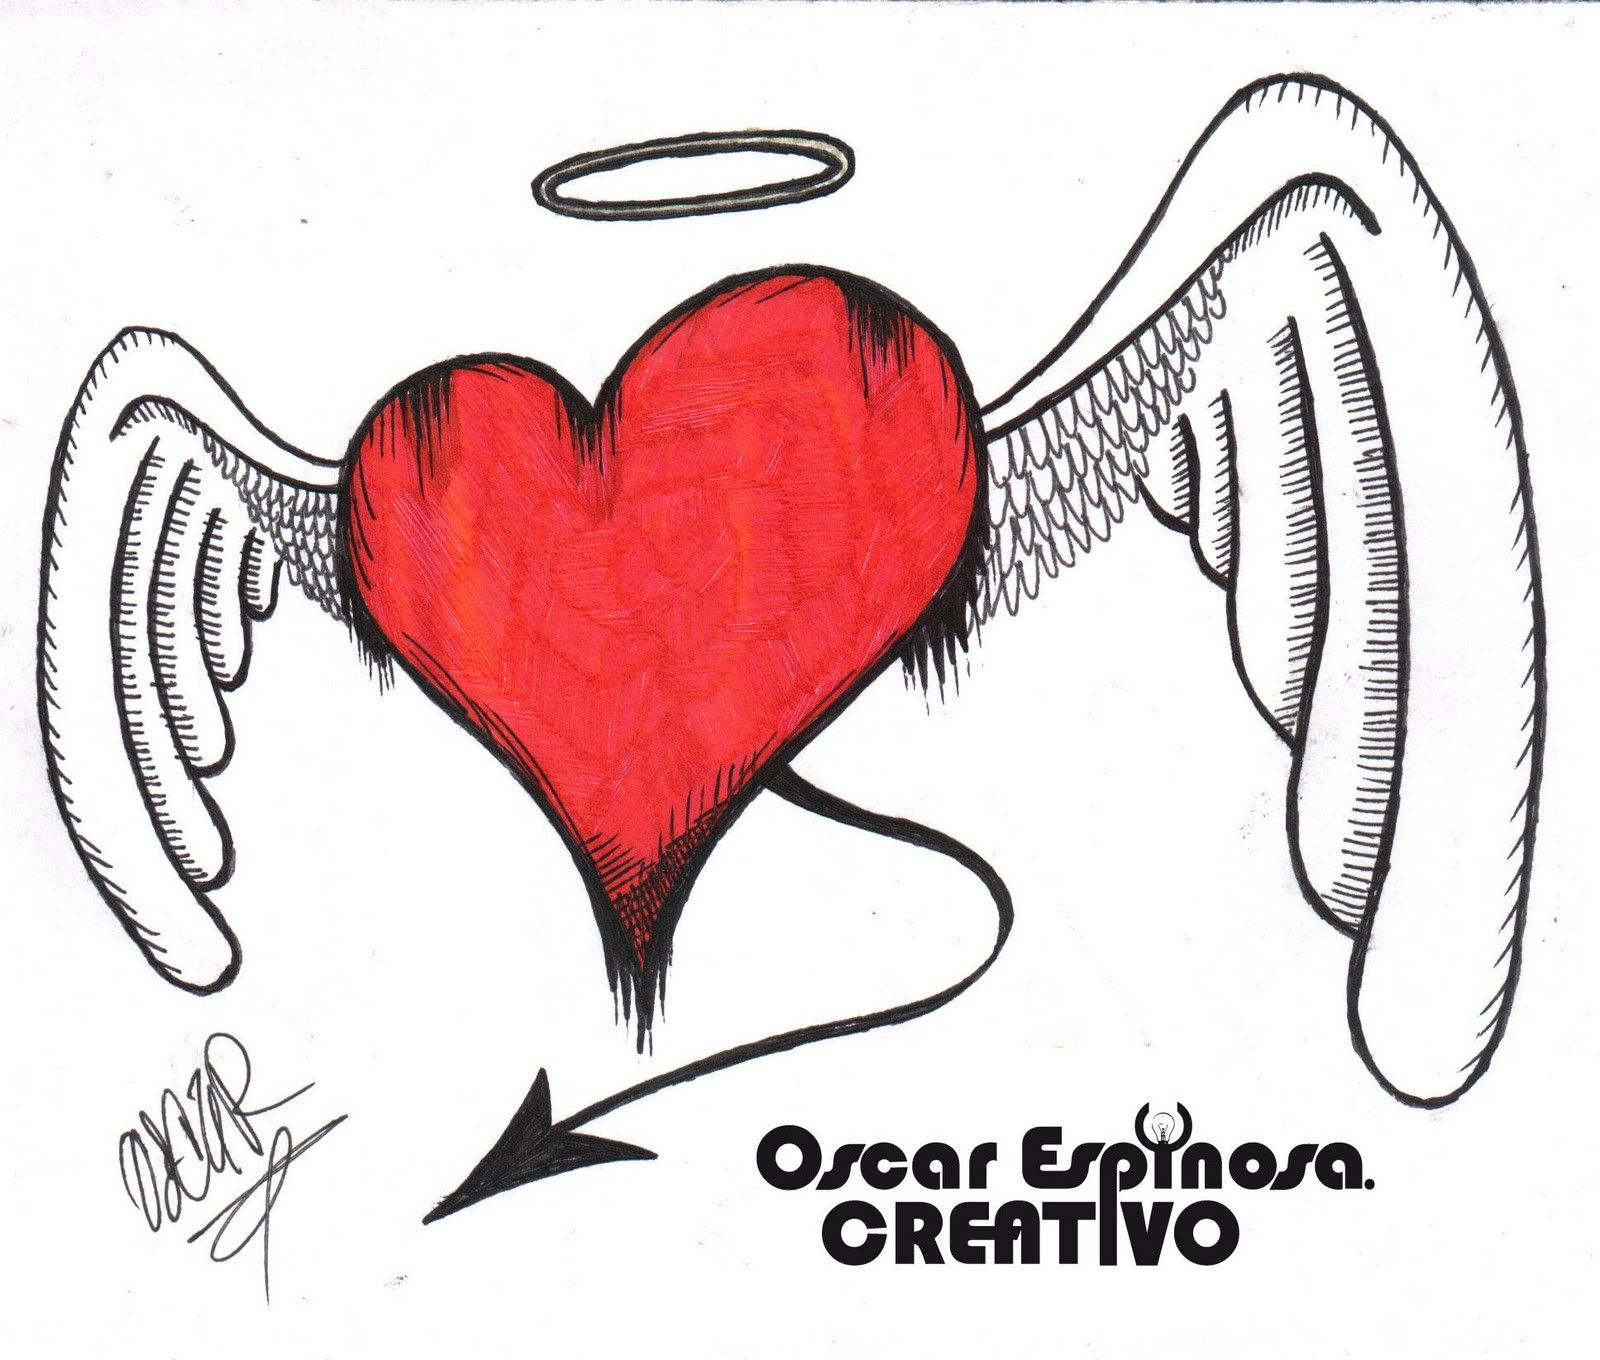 Dibujos A Lapiz De Corazones Con Alas Imagui